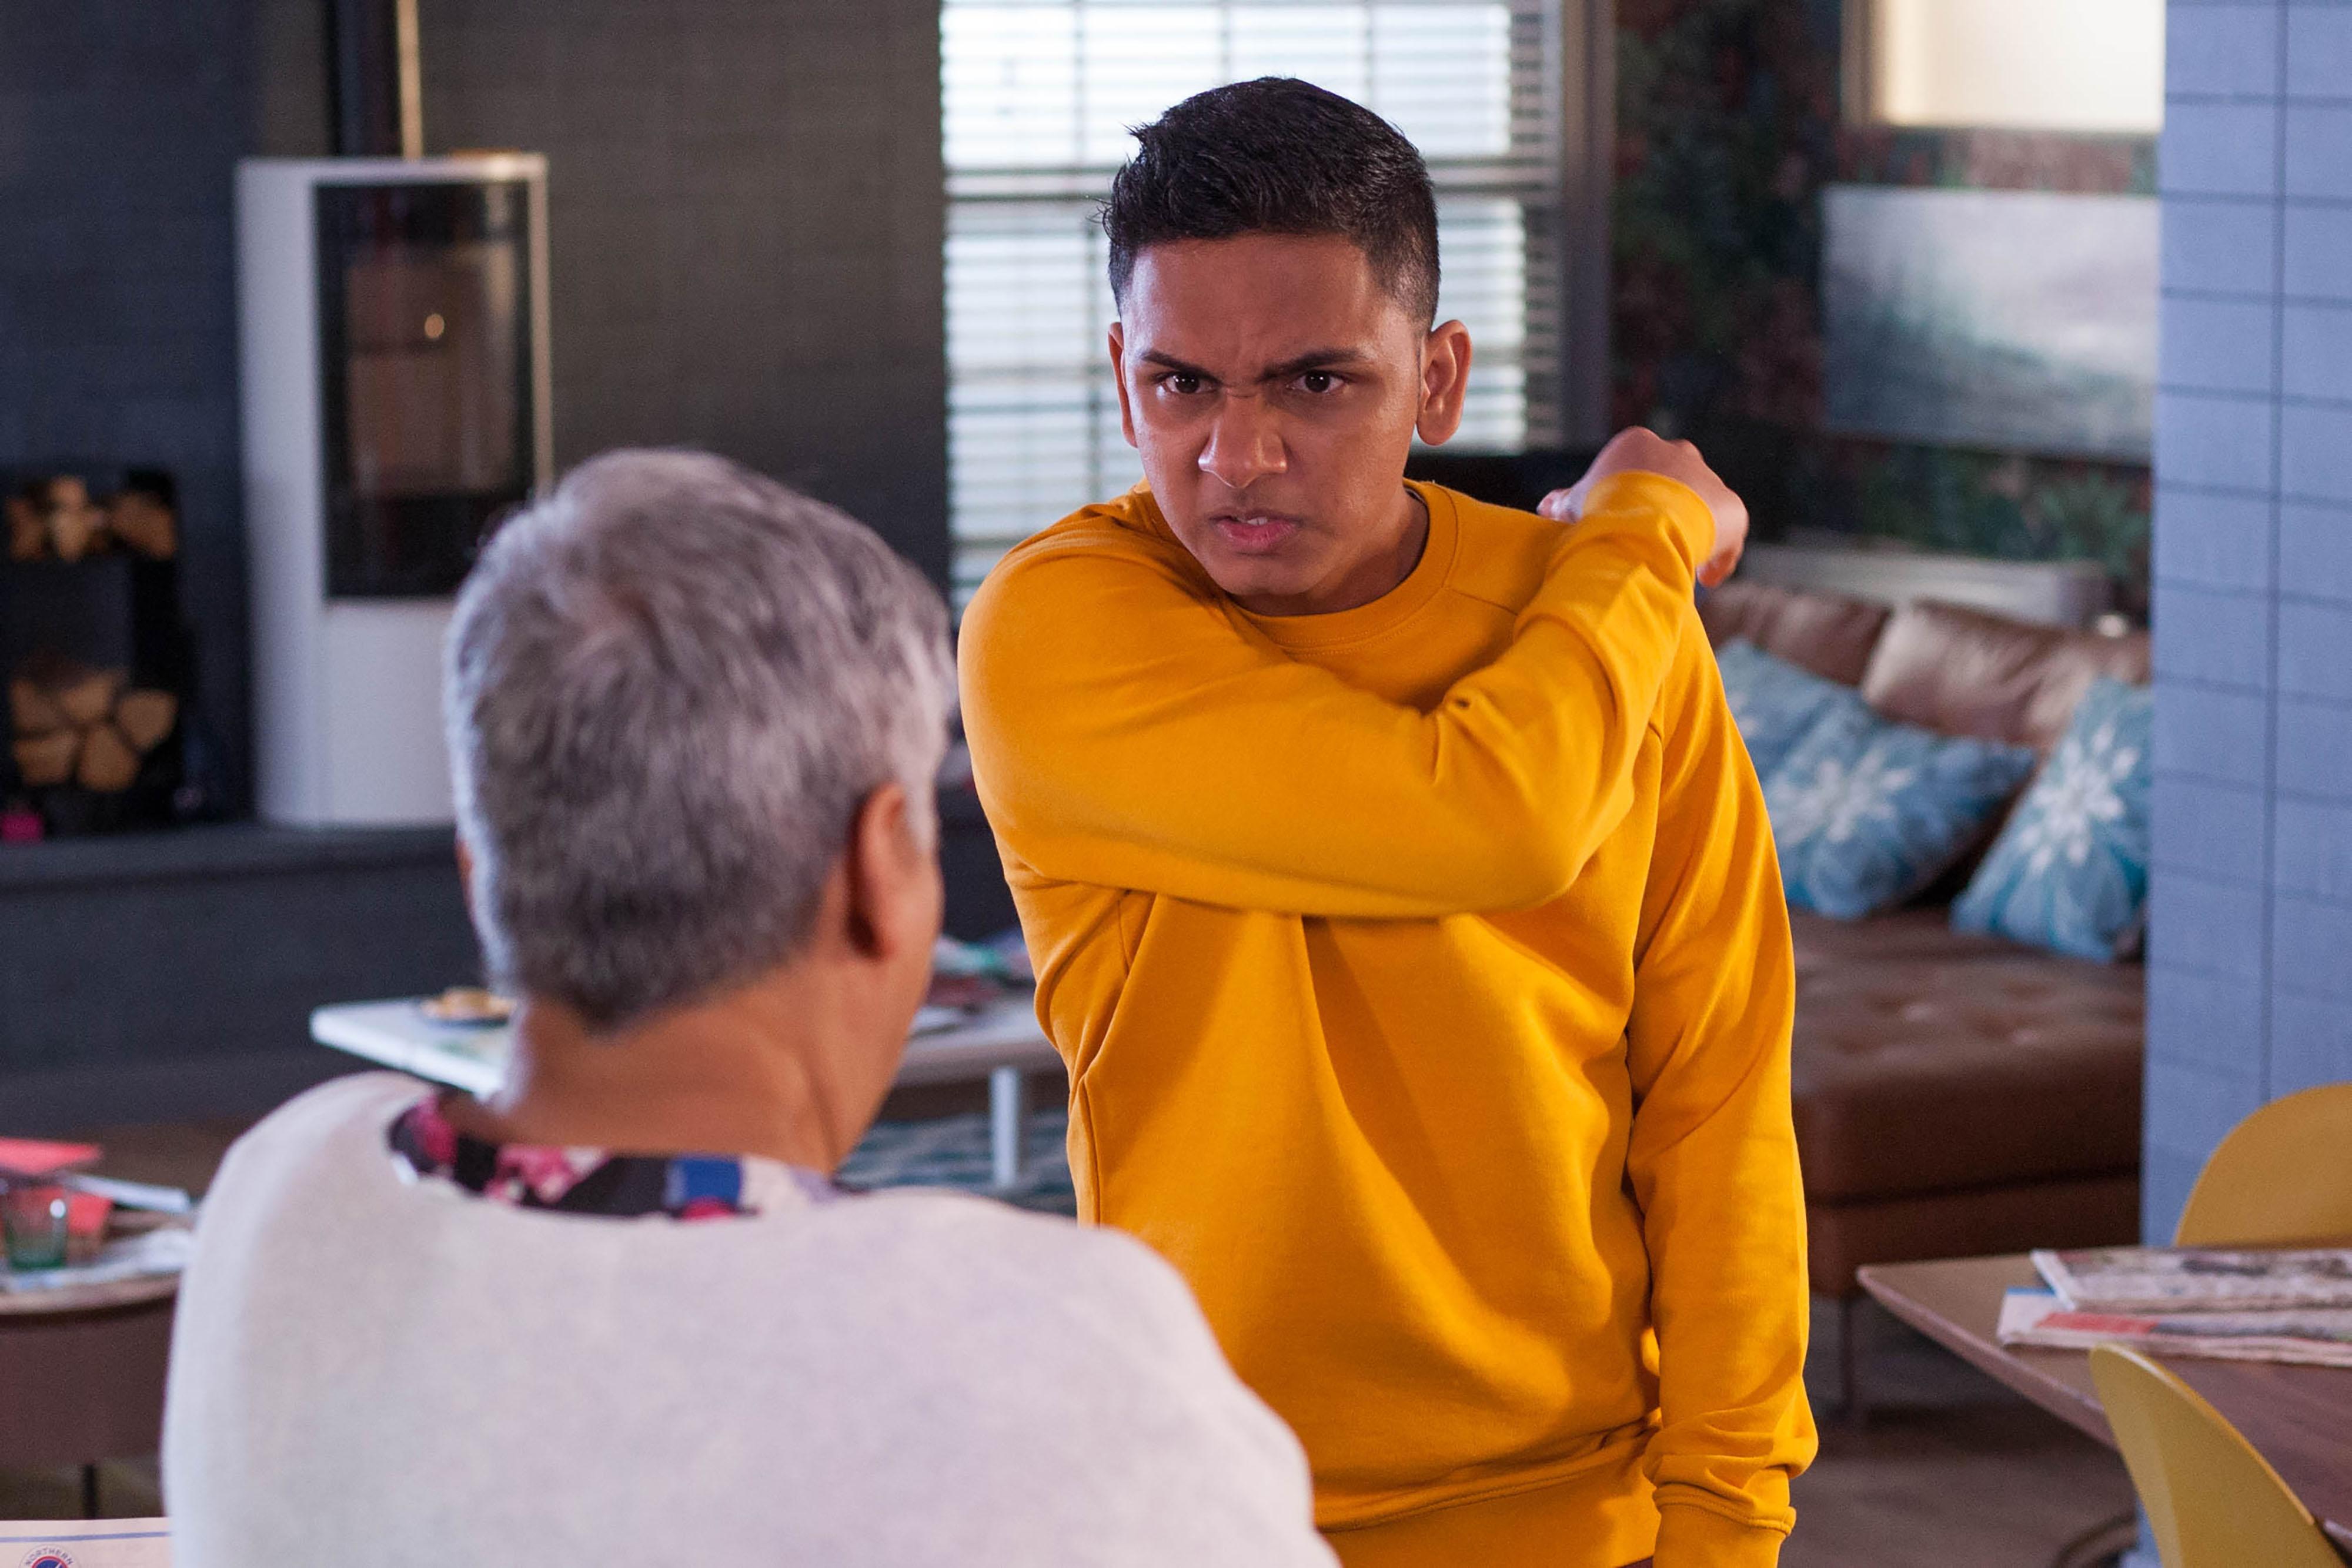 Hollyoaks spoilers: Imran turns violent as he romances Brooke